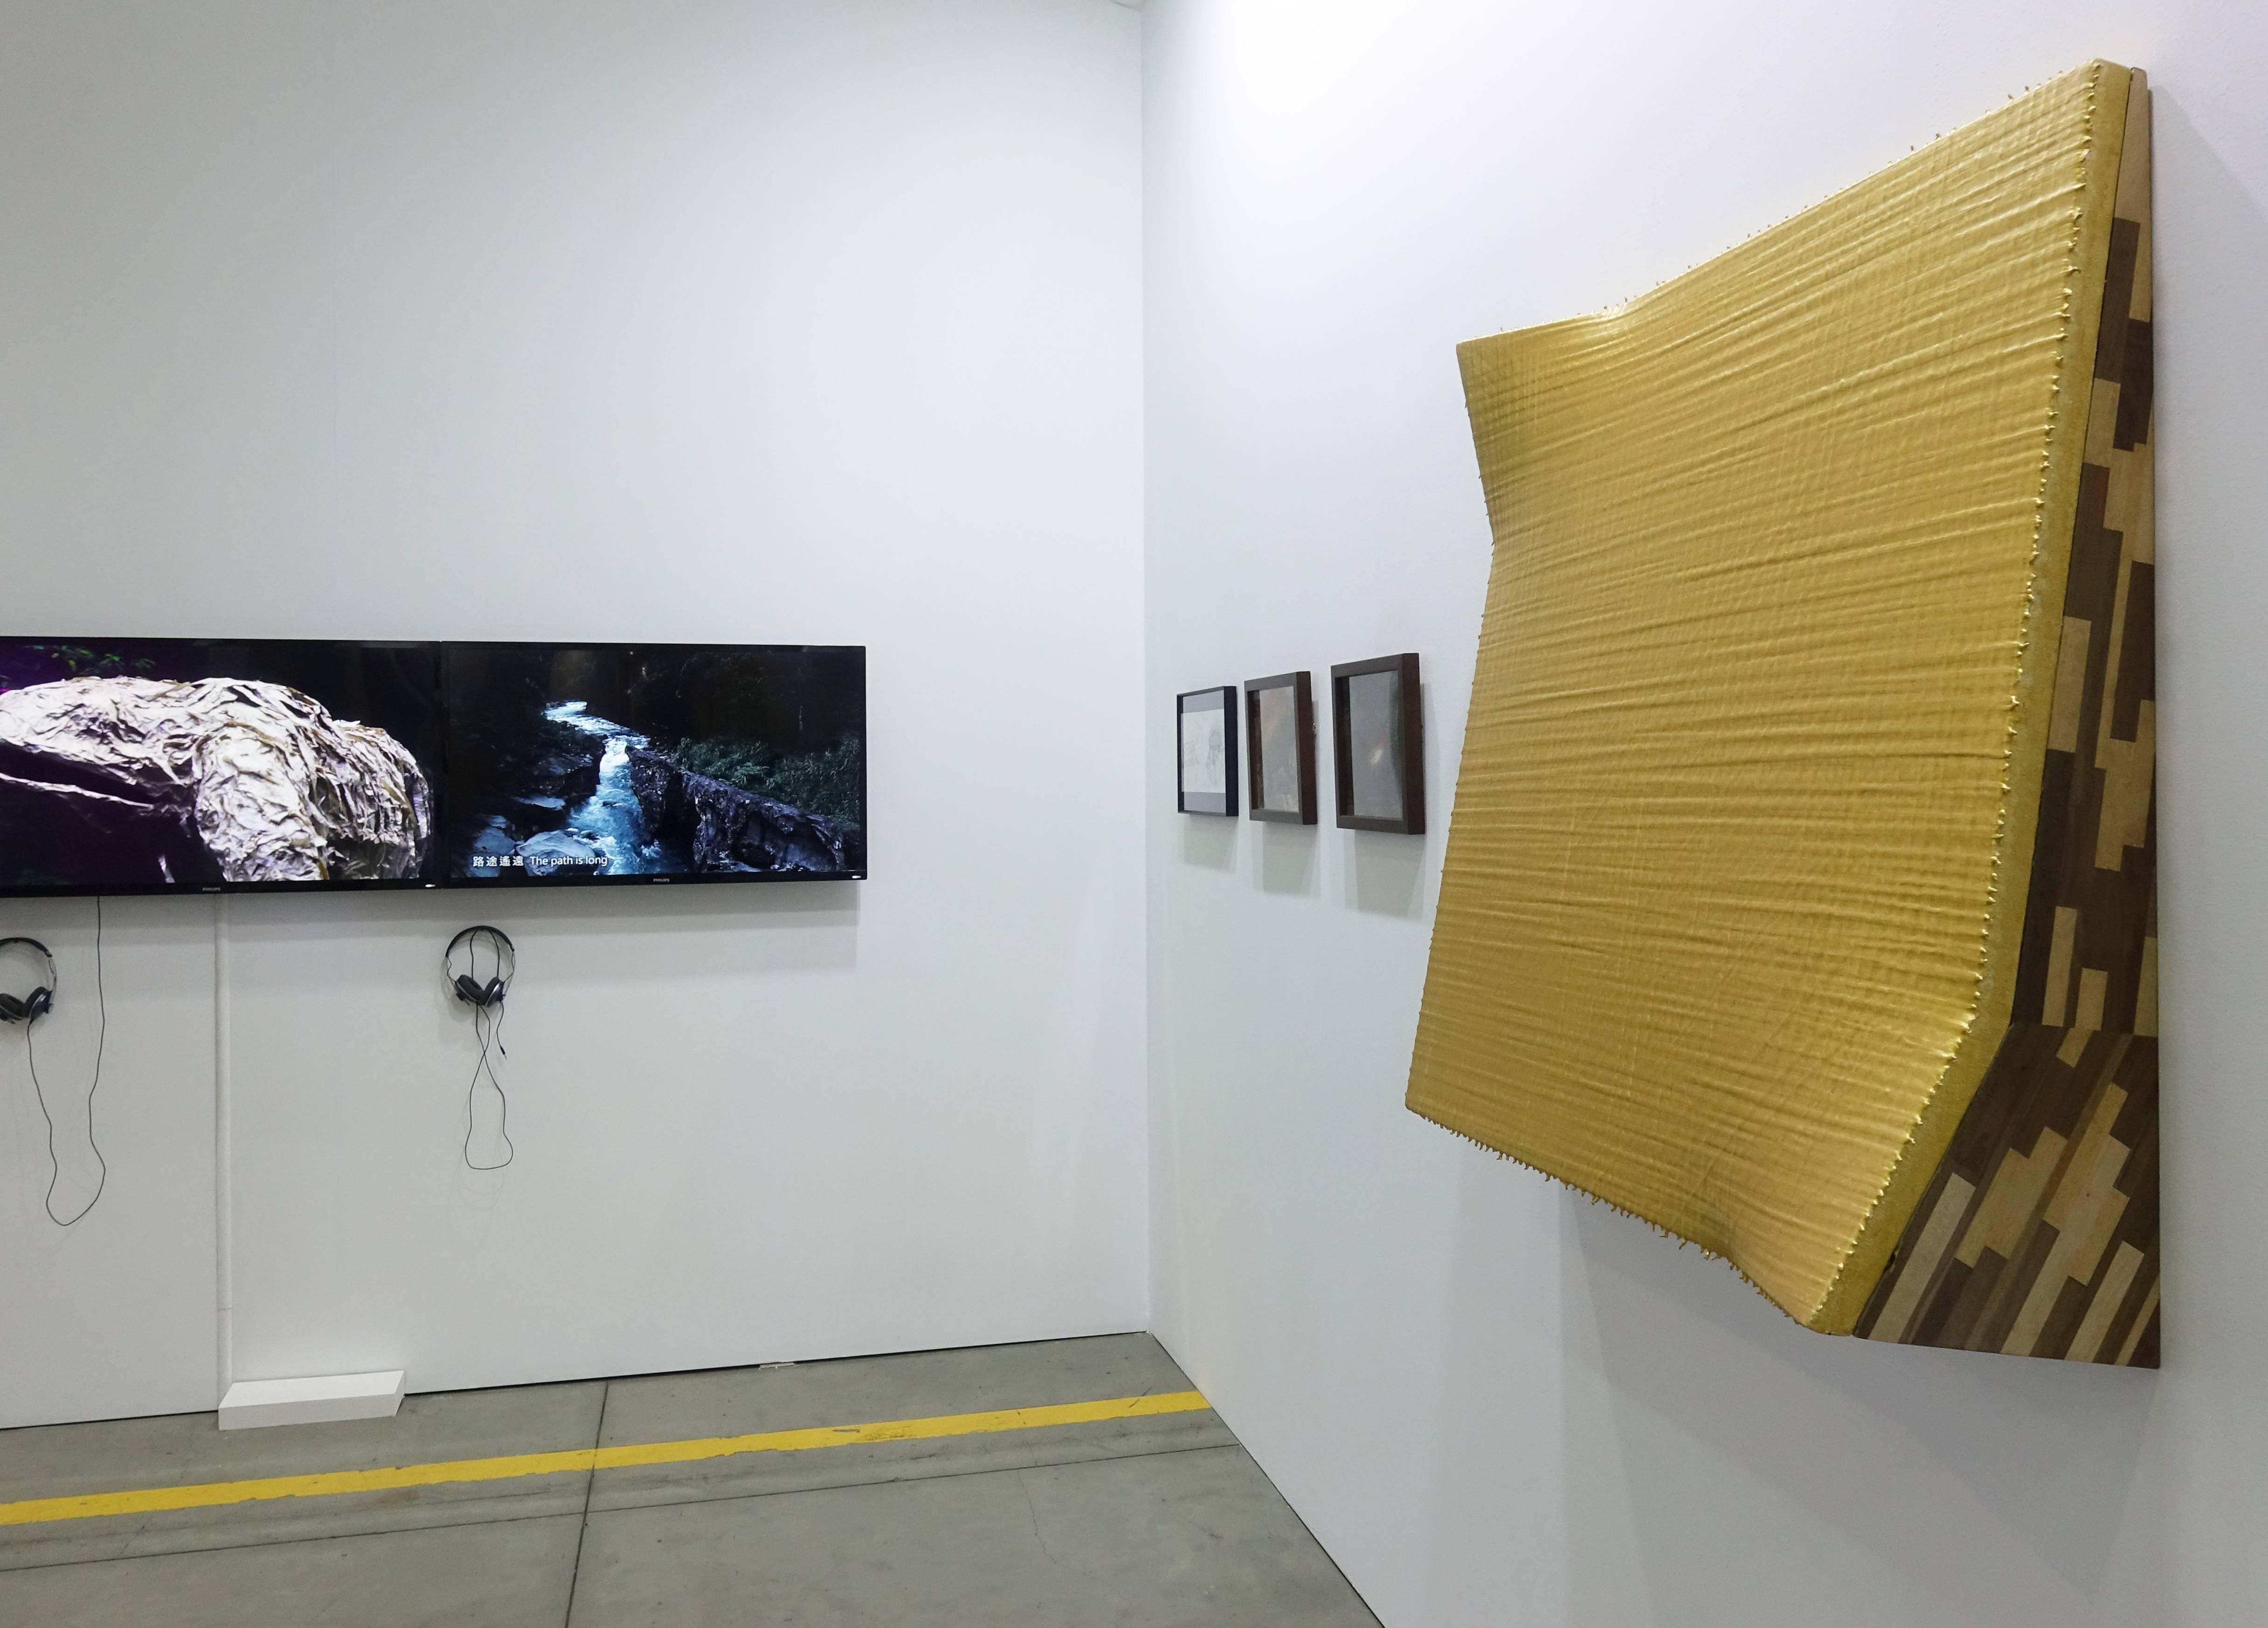 A01 亞洲當代藝術空間展出作品。